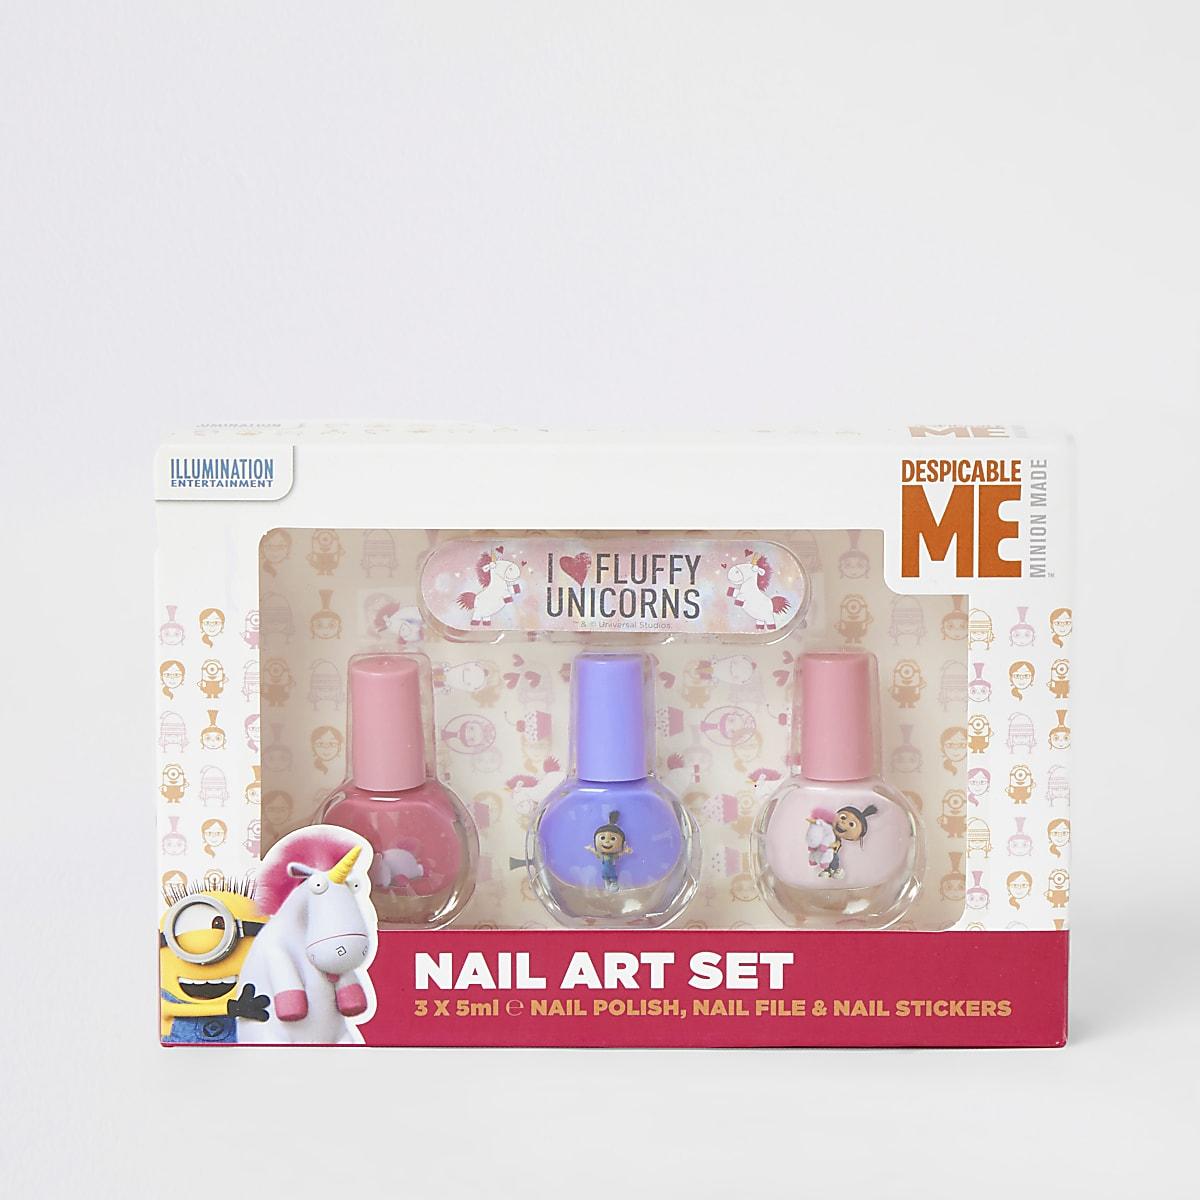 Despicable Me nail art set